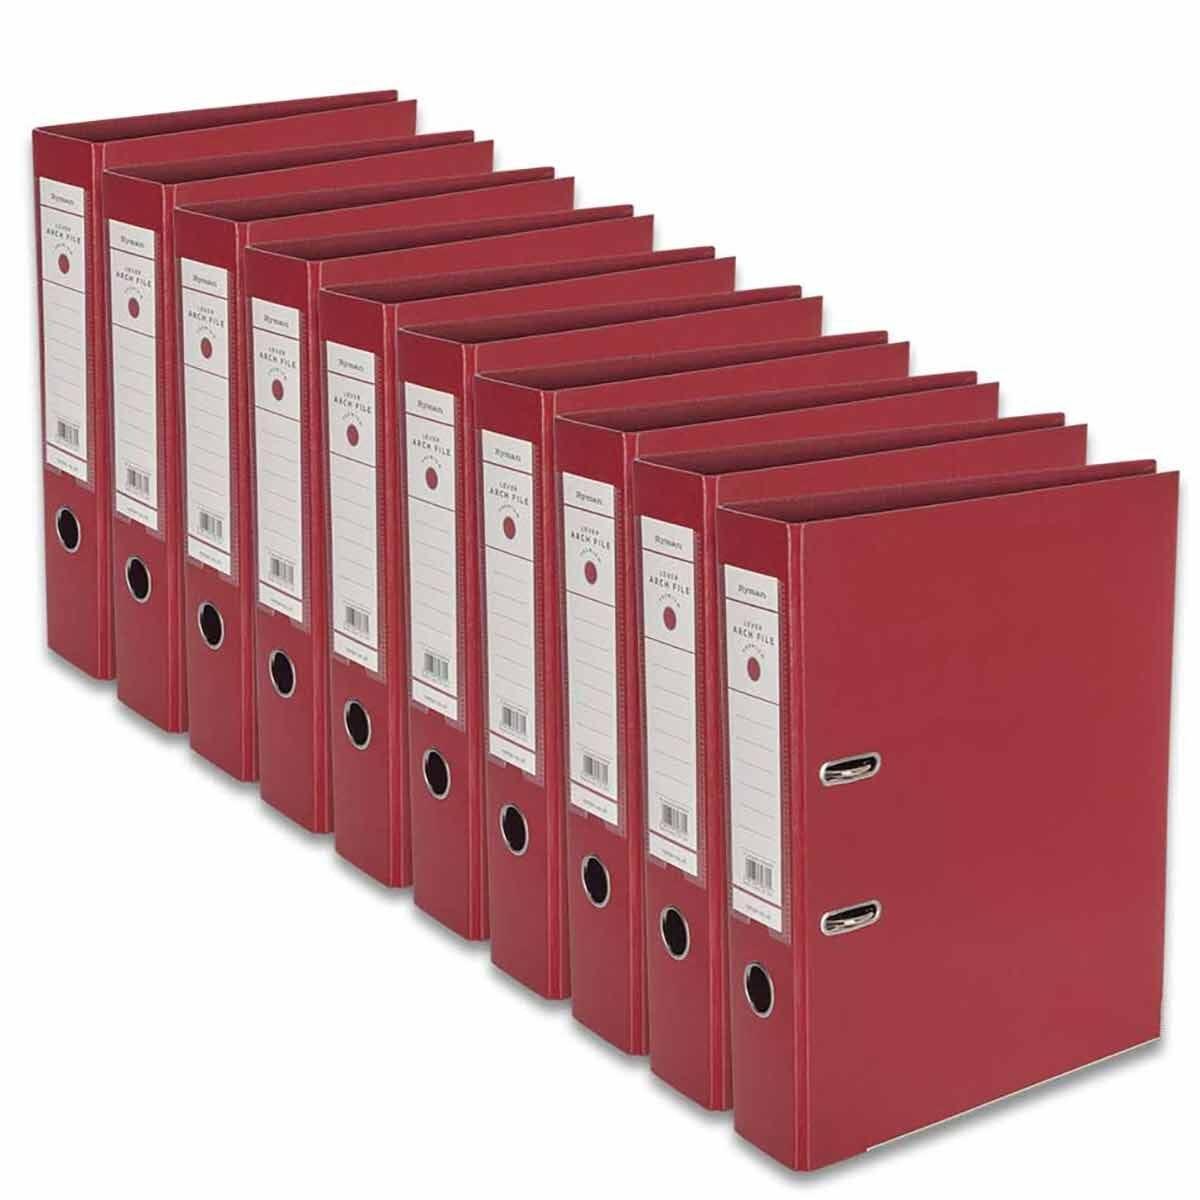 Ryman Premium Lever Arch Files Foolscap Pack of 10 Burgundy